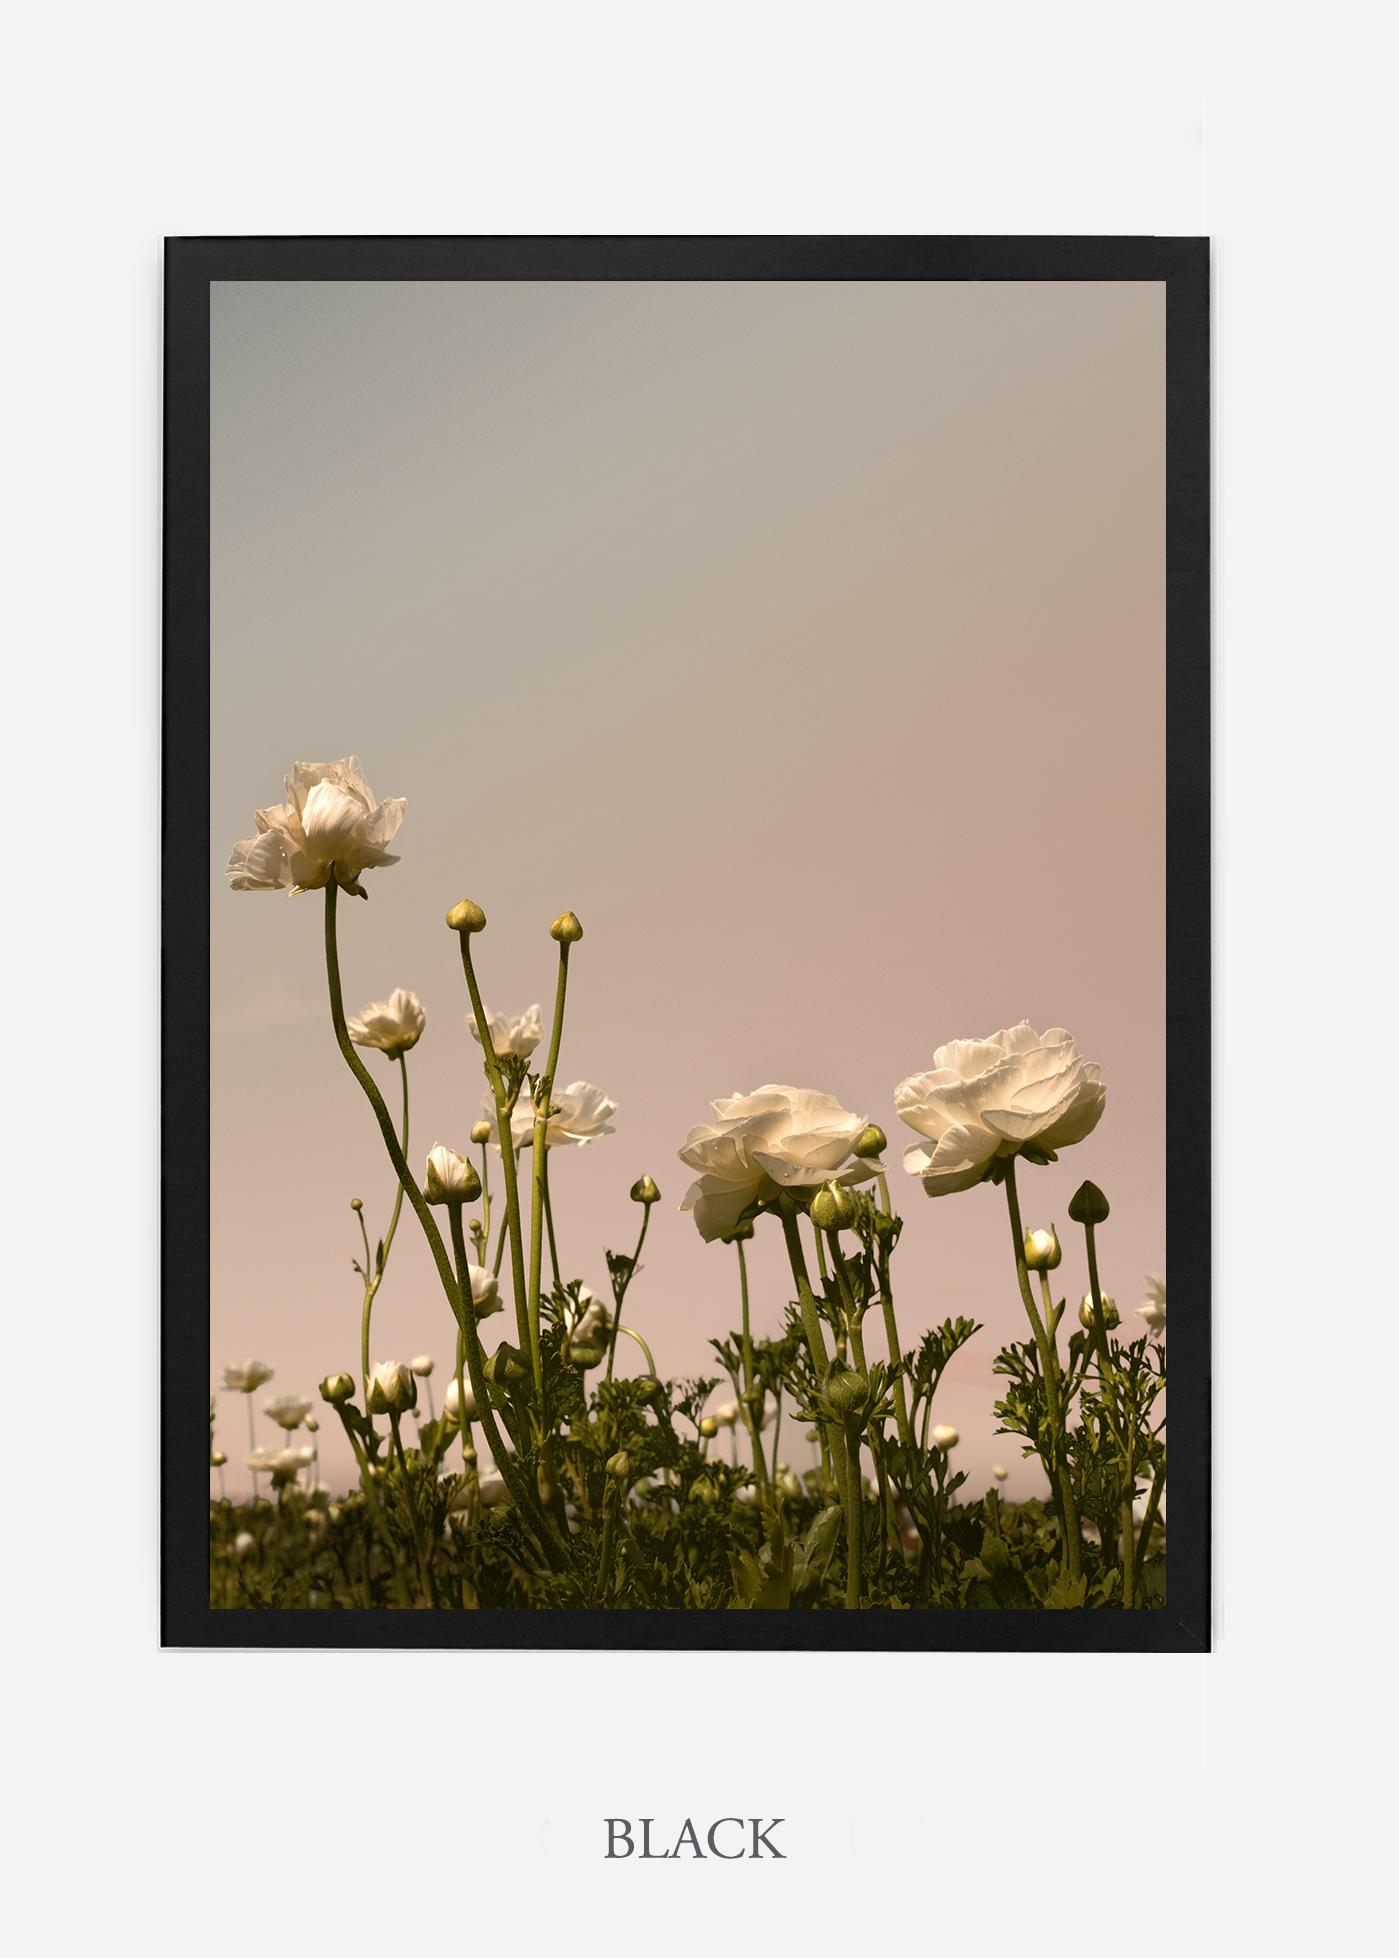 NoMat-Black-Frame-Floral-No-7-Wilder-California-Art-Floral-Home-decor-Prints-Dahlia-Botanical-Artwork-Interior-design.jpg